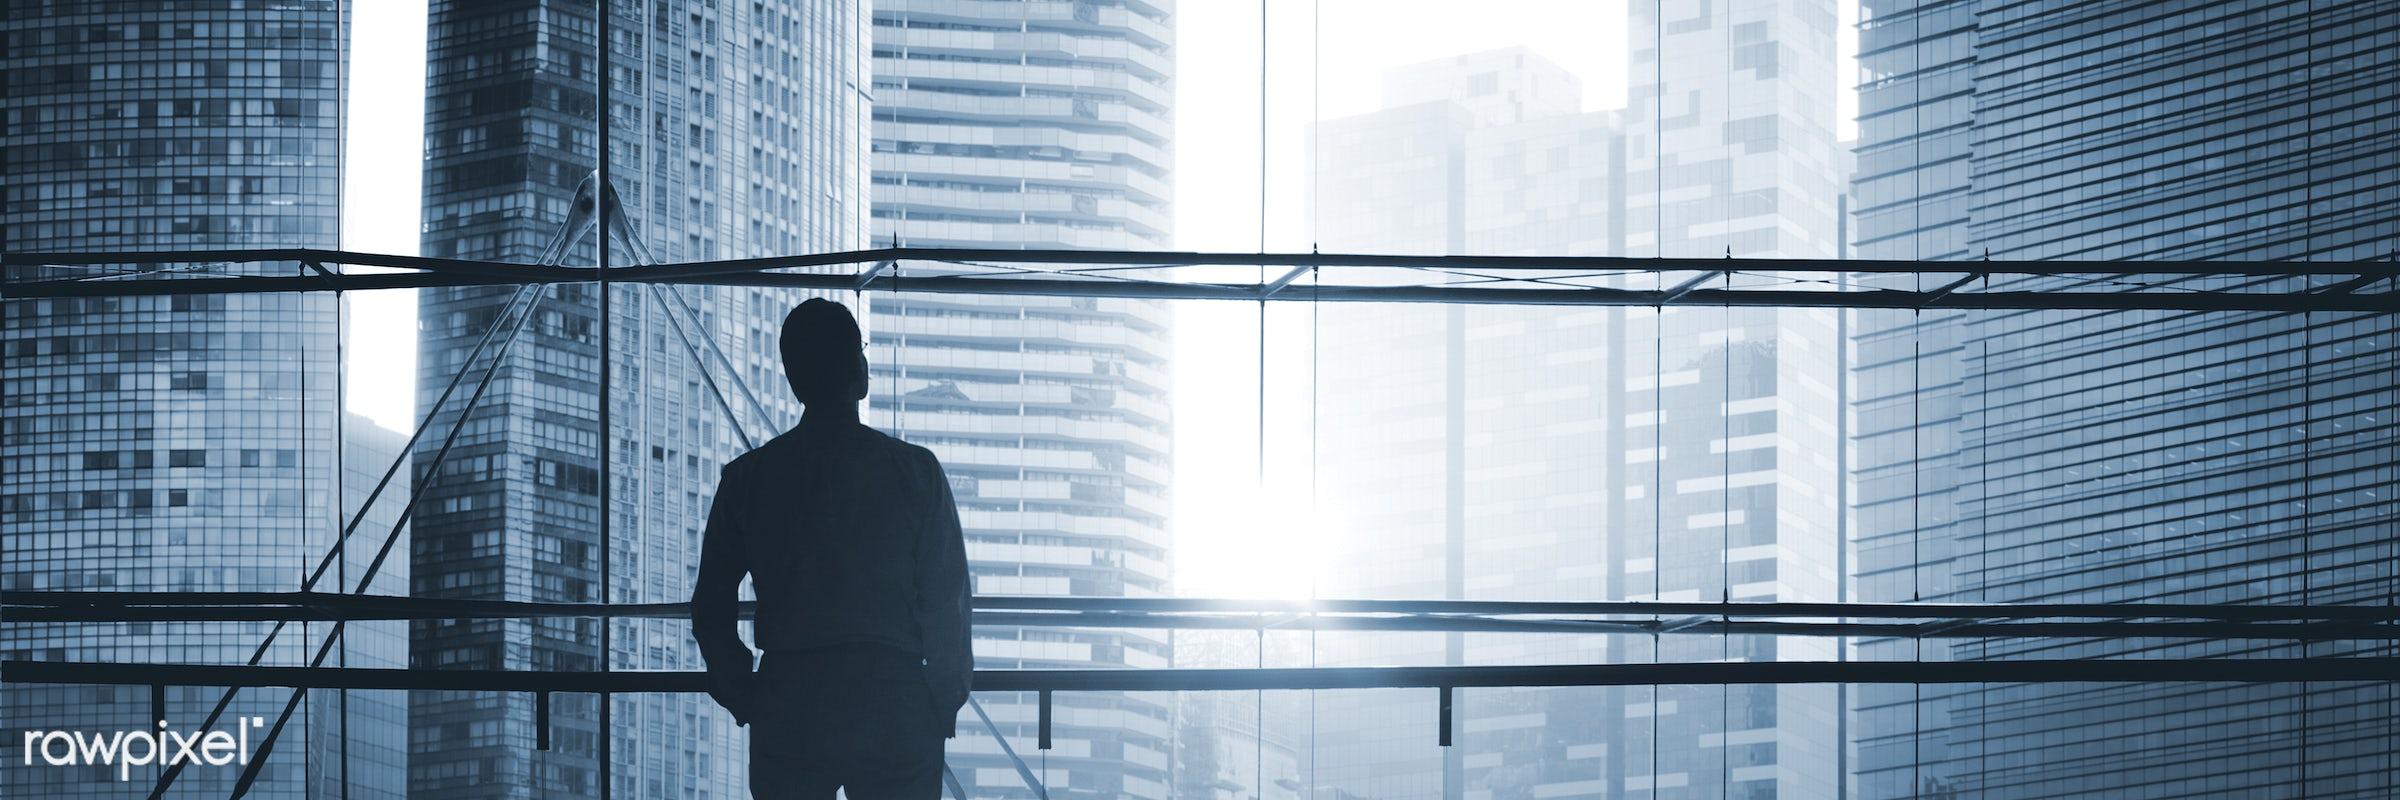 achievement, aspiration, board room, brainstorm, break, building, business, business people, businessman, ceo, city view,...